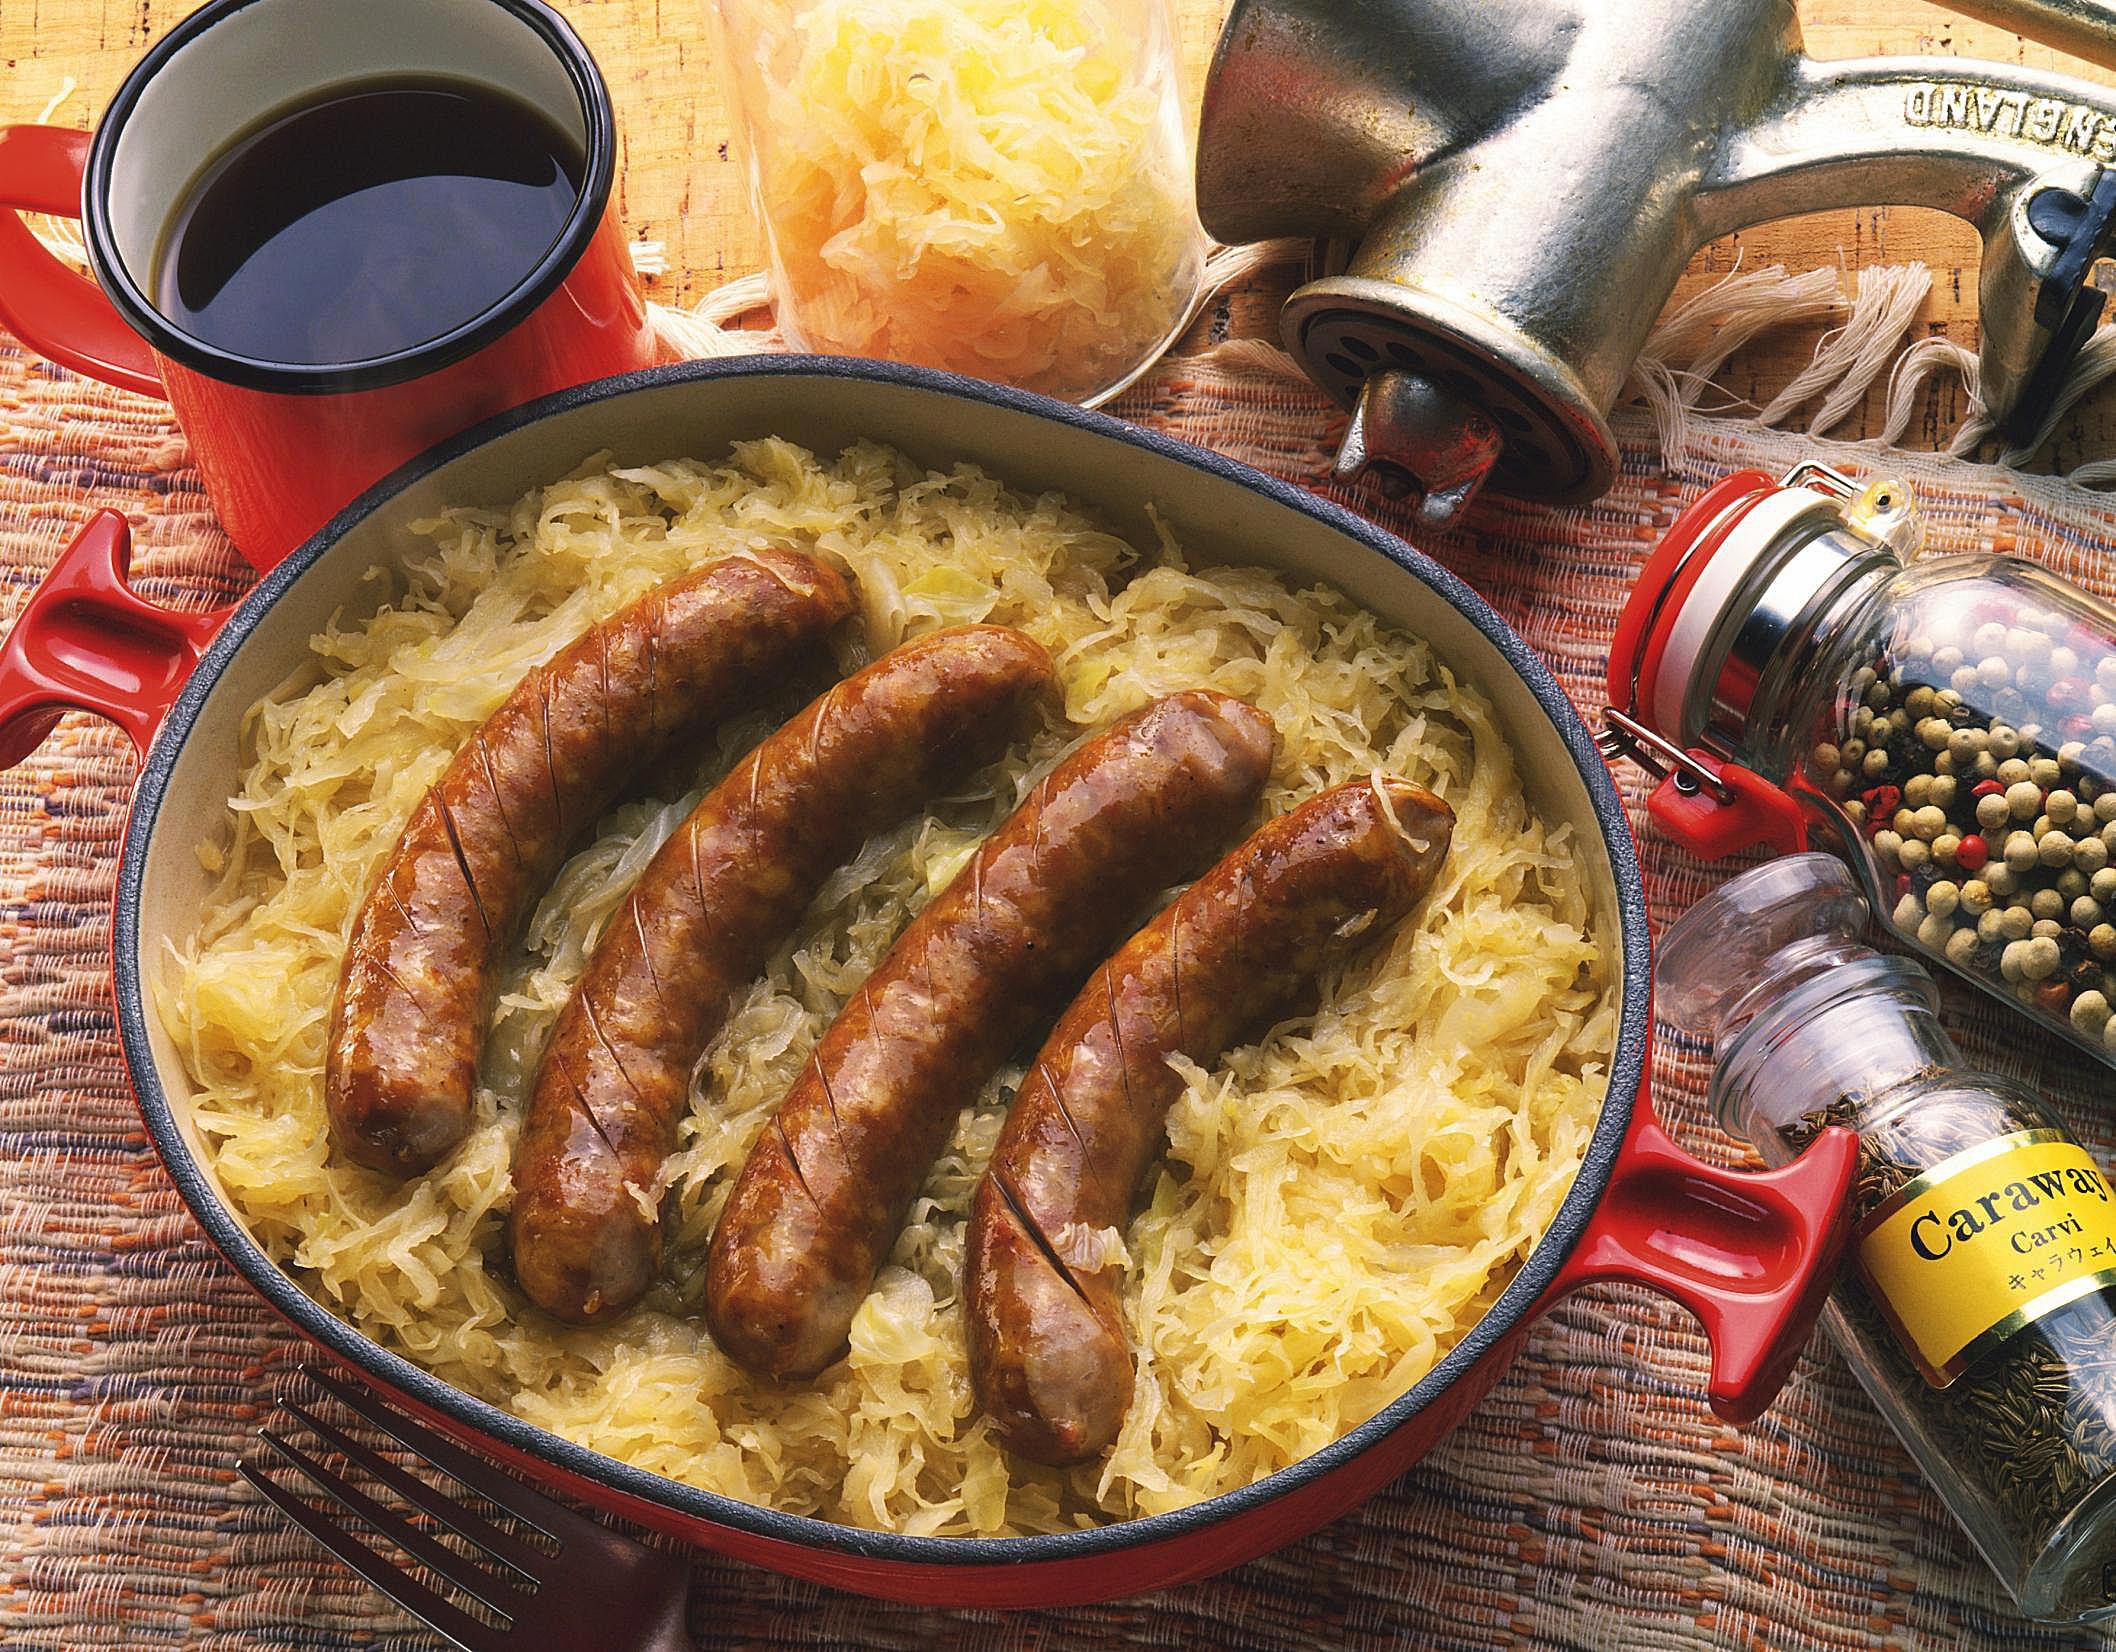 German Sausage and Sauerkraut Recipes